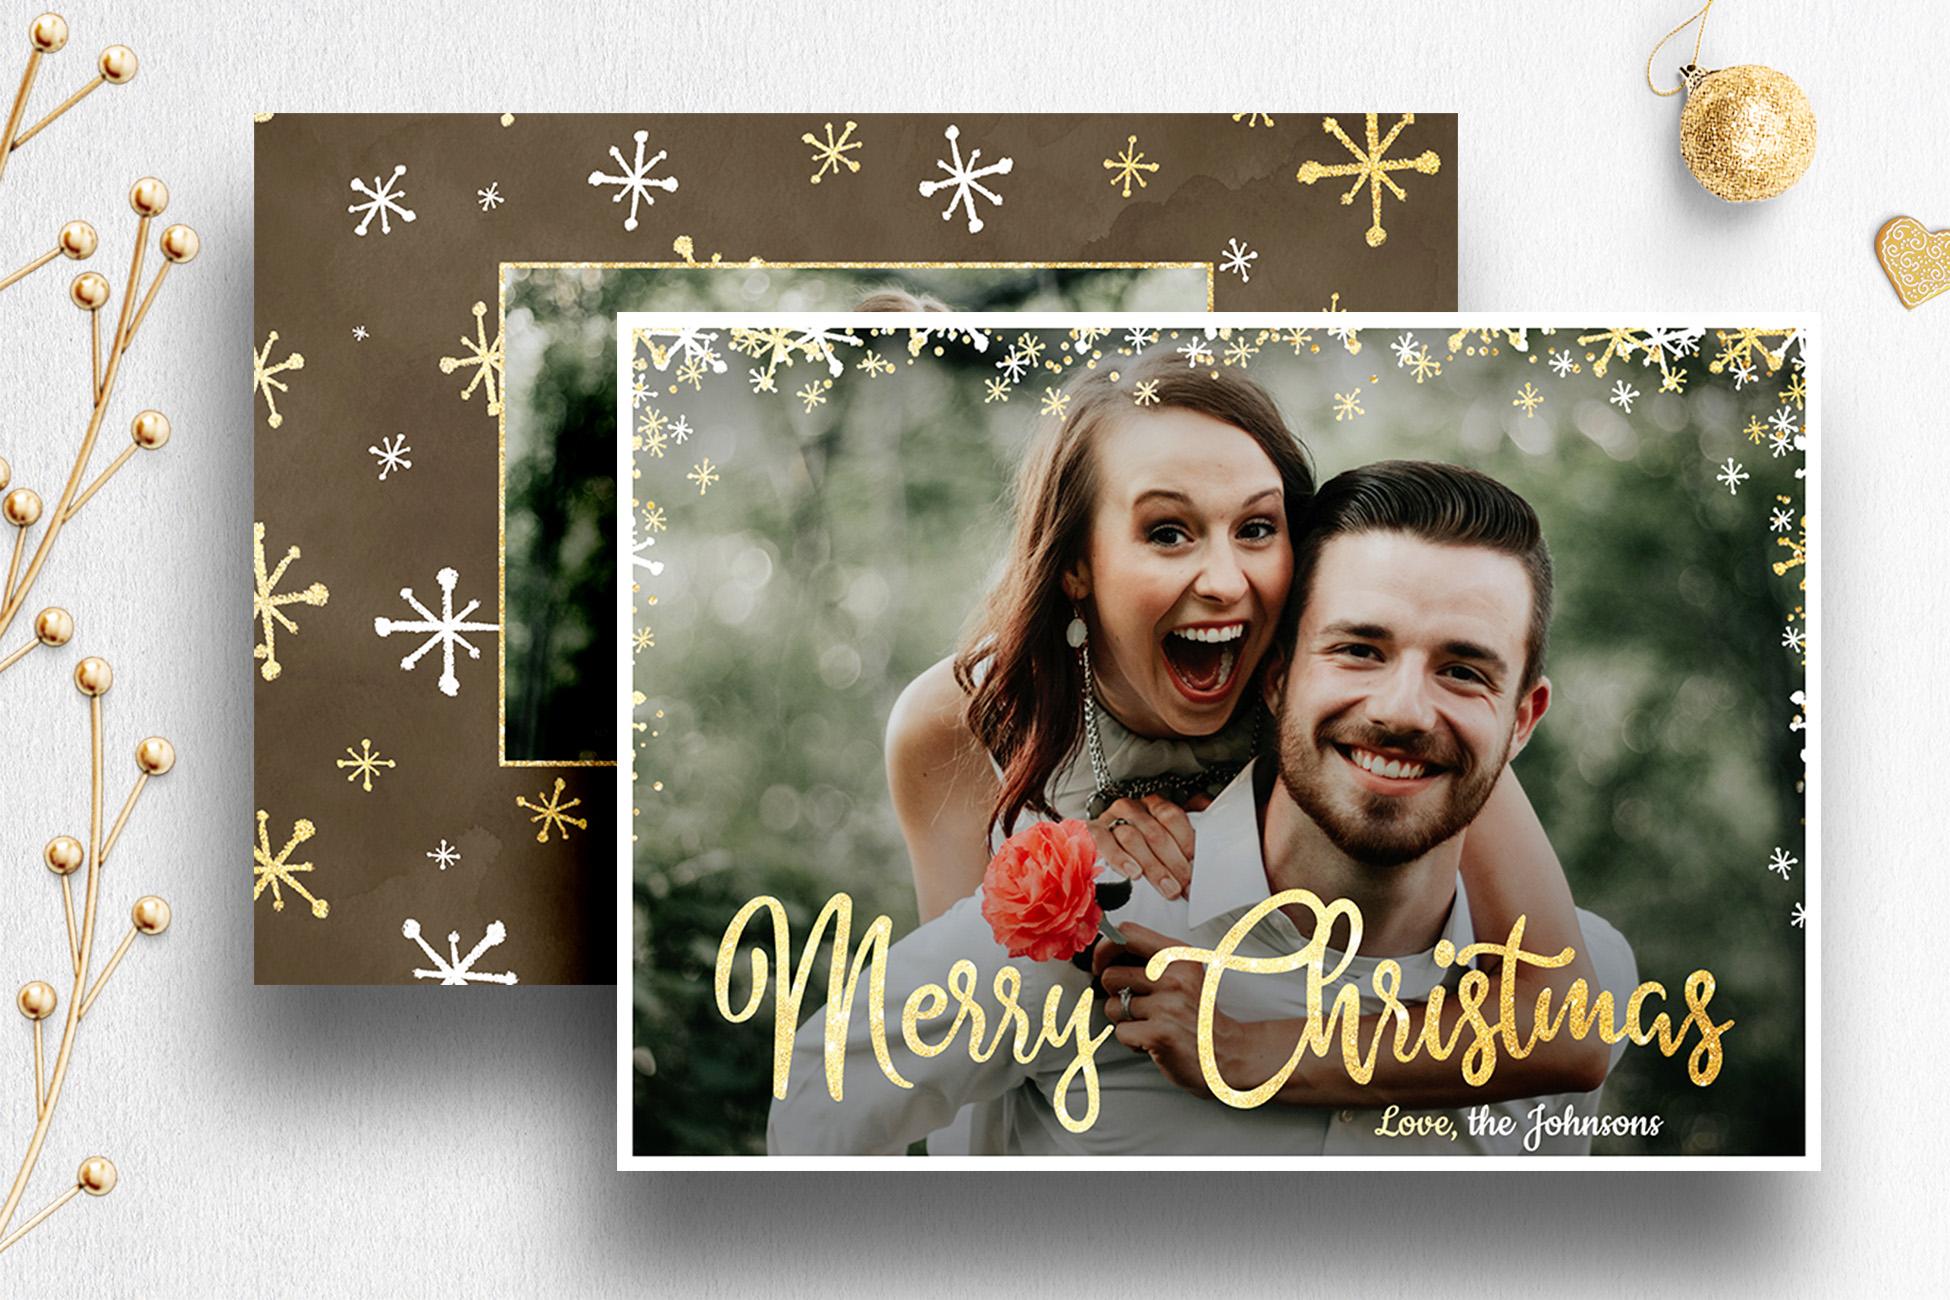 Christmas Card Photoshop Template for Photog | 007